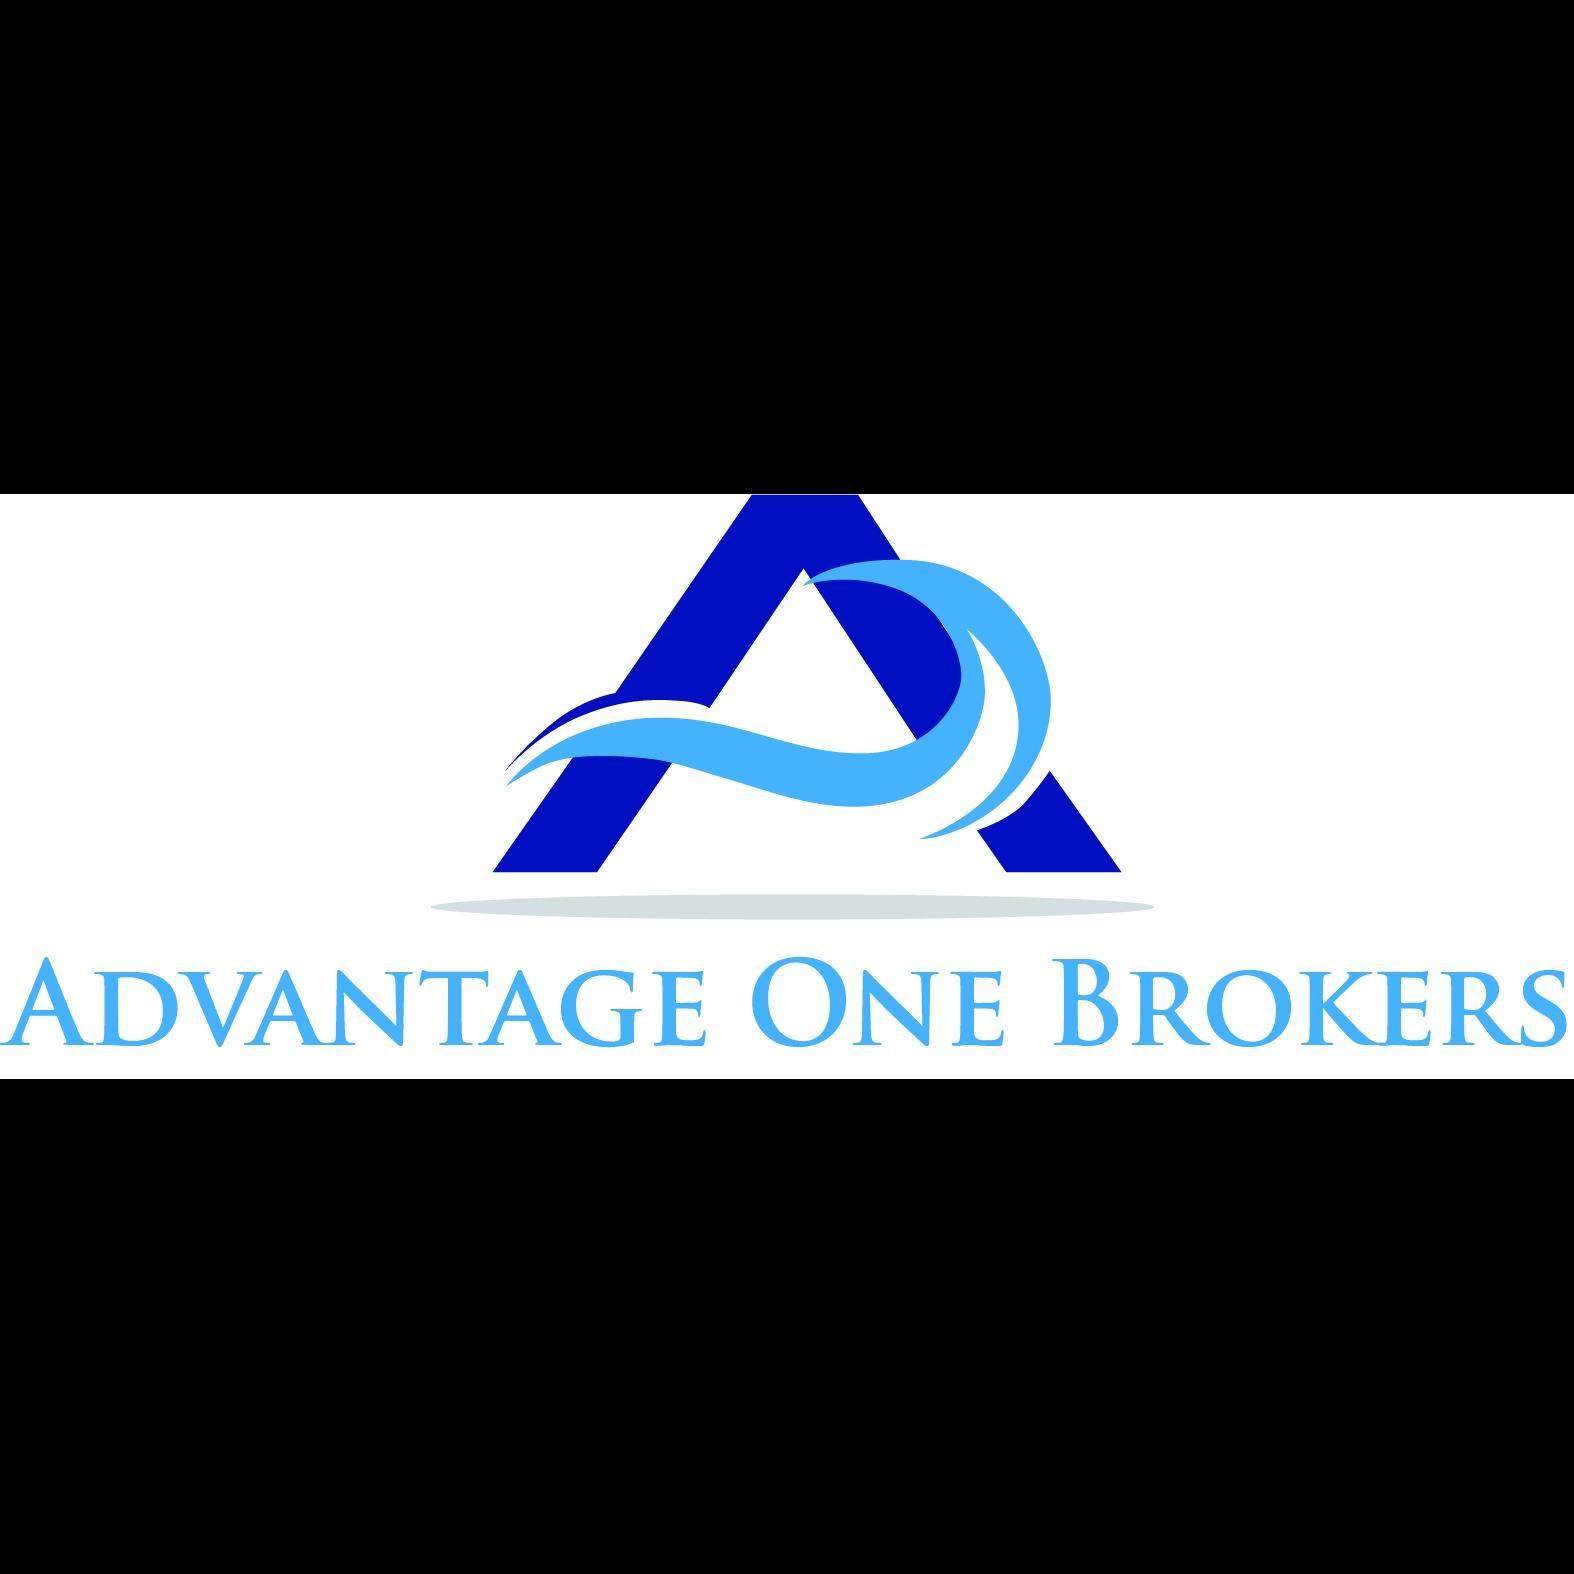 Advantage 1 Brokers